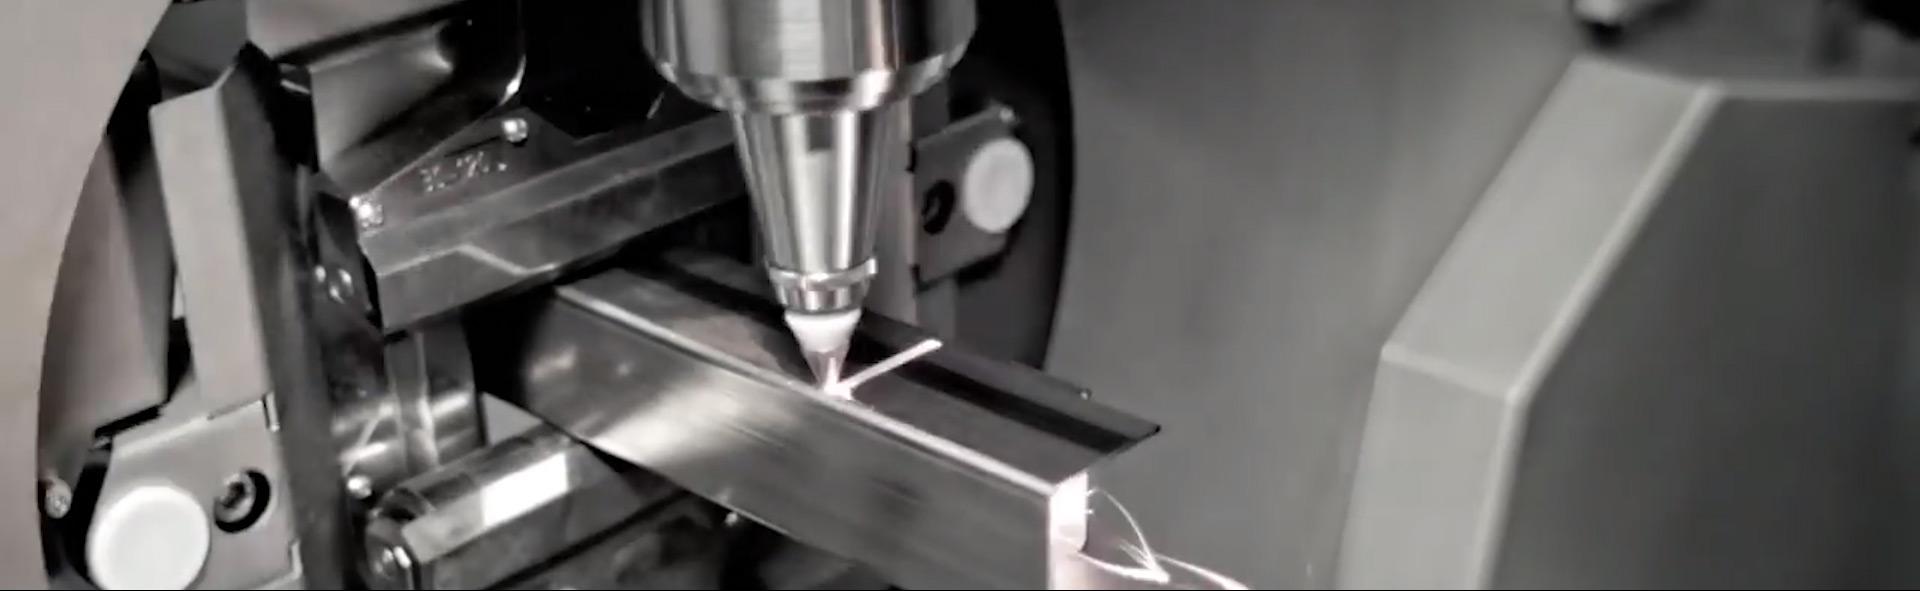 laser-cut-bg